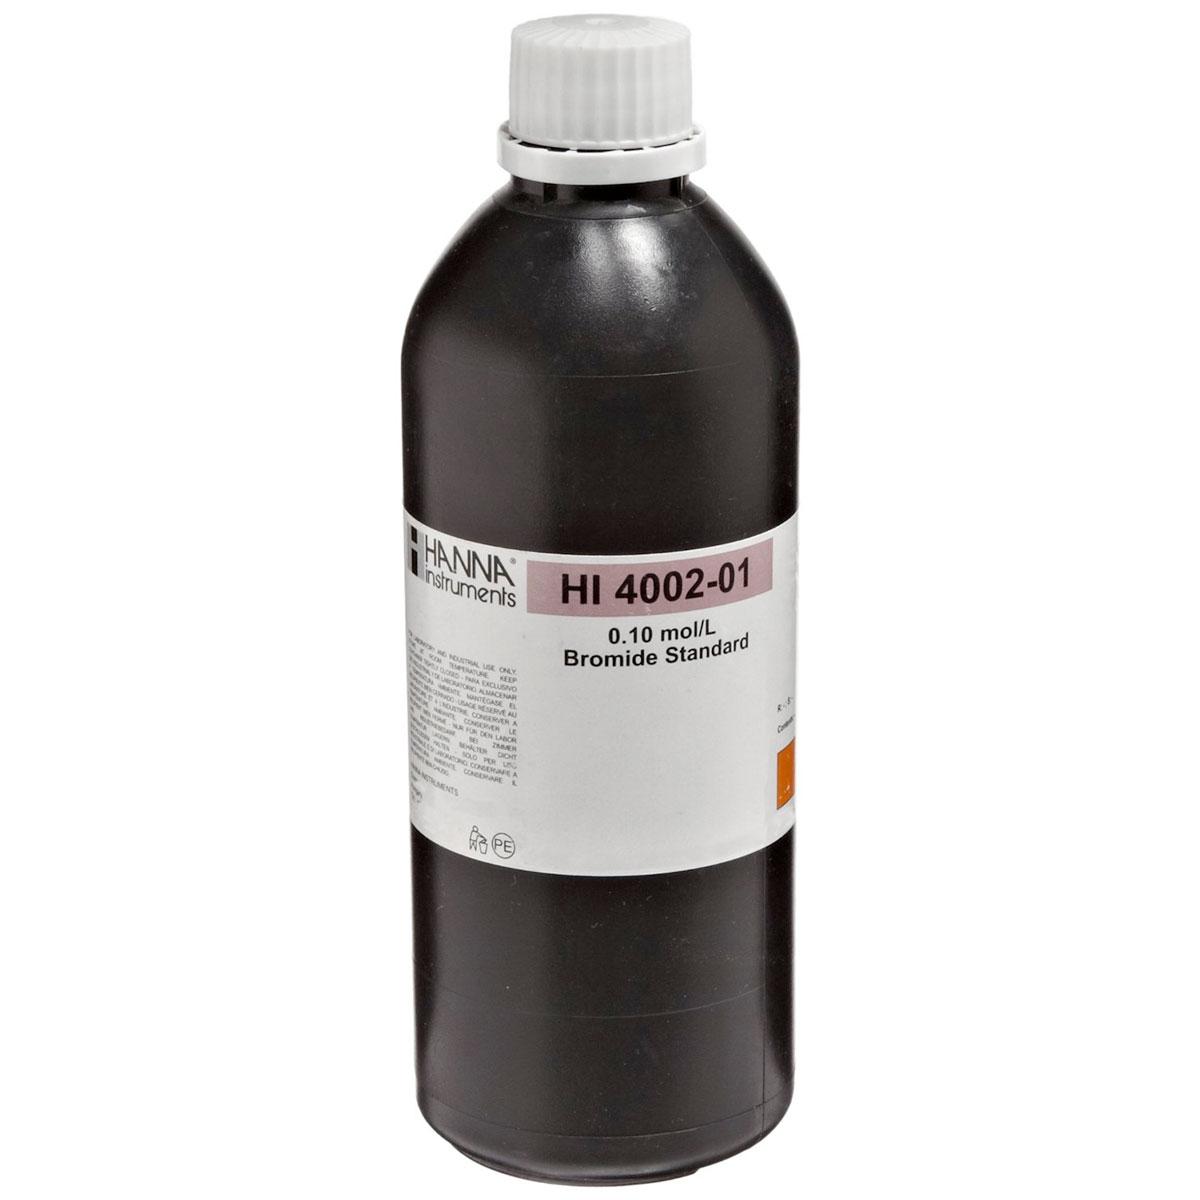 Solución Estándar de Bromuro 0.1M para ISE - HI4002-01